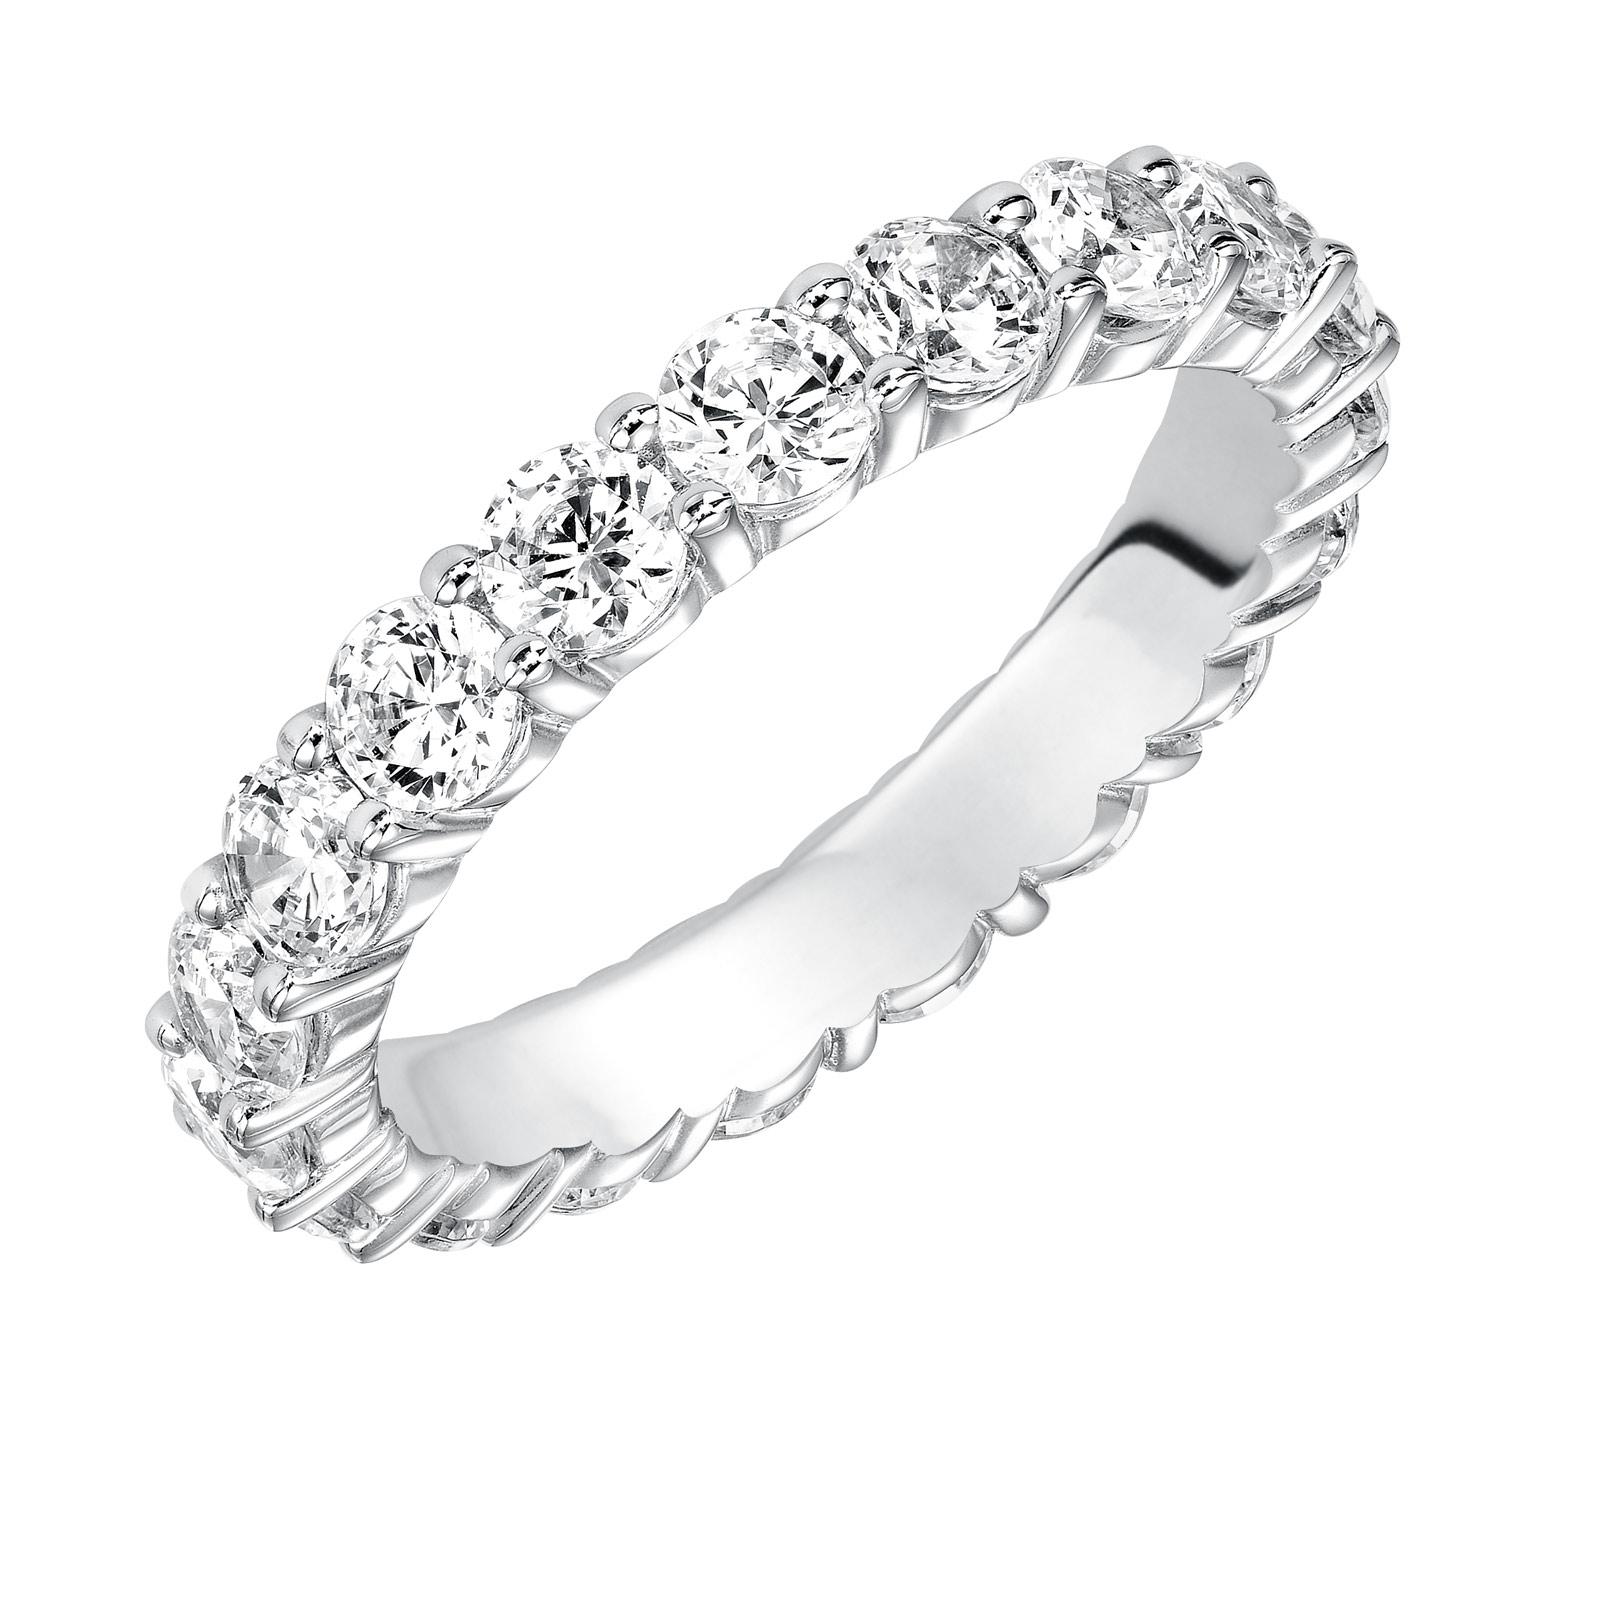 Goldman ring 33 15k4w65 l00 long island ny goldman for Long island wedding bands